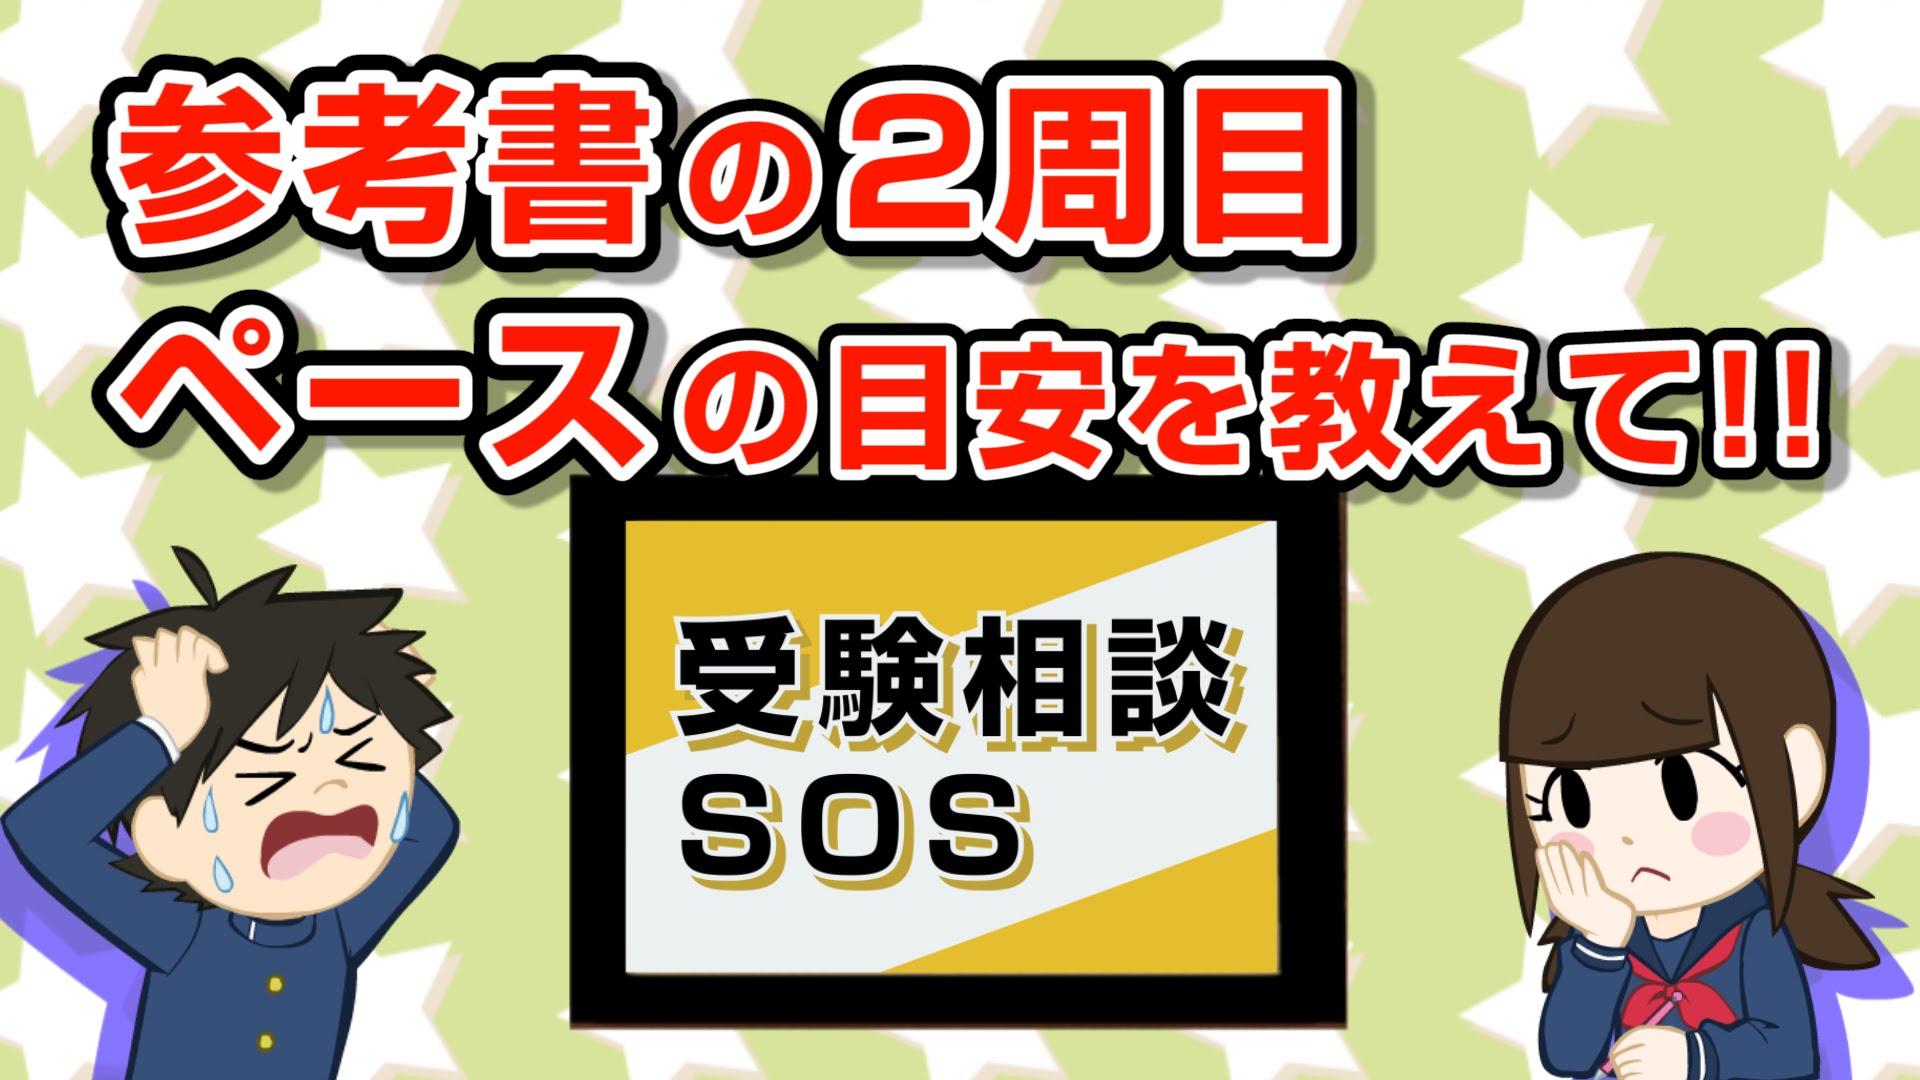 【vol.678】参考書2周目のペースは、1周目と比べ何倍ペース!?|受験相談SOS